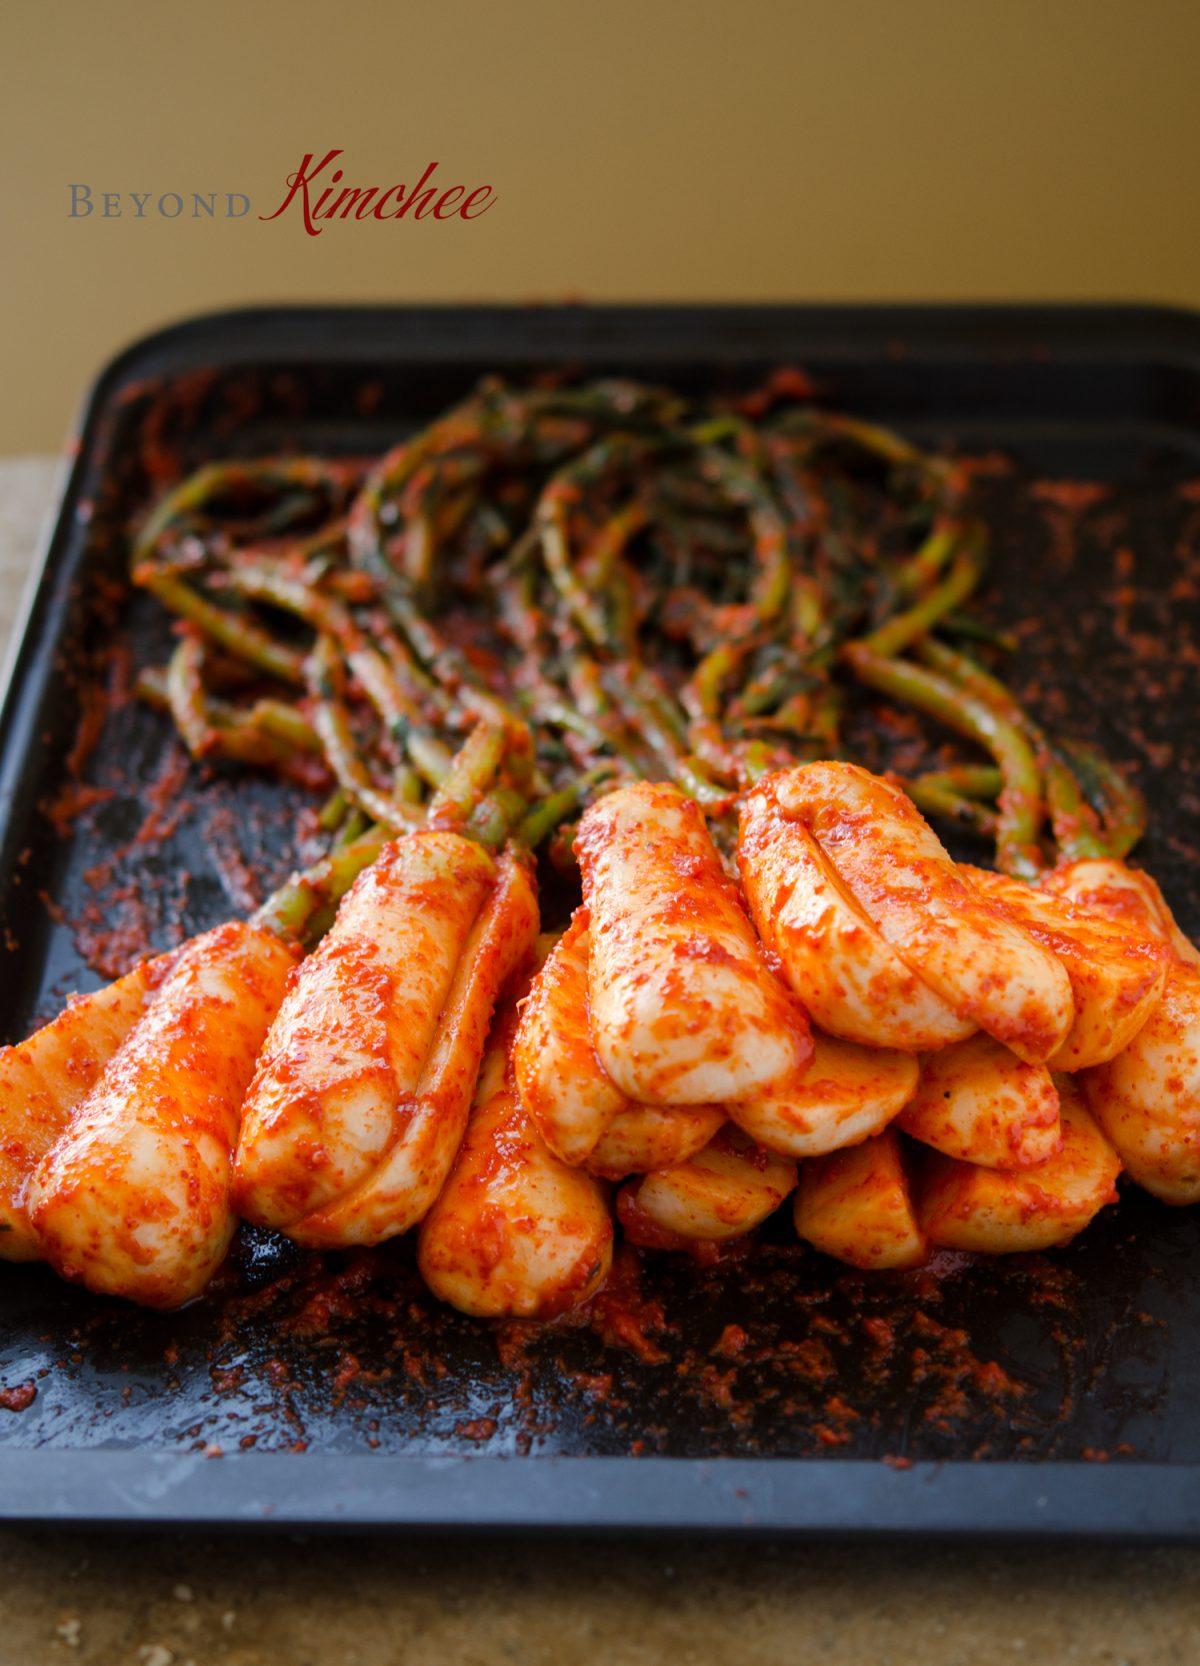 Bachelor Kimchi Beyond Kimchee